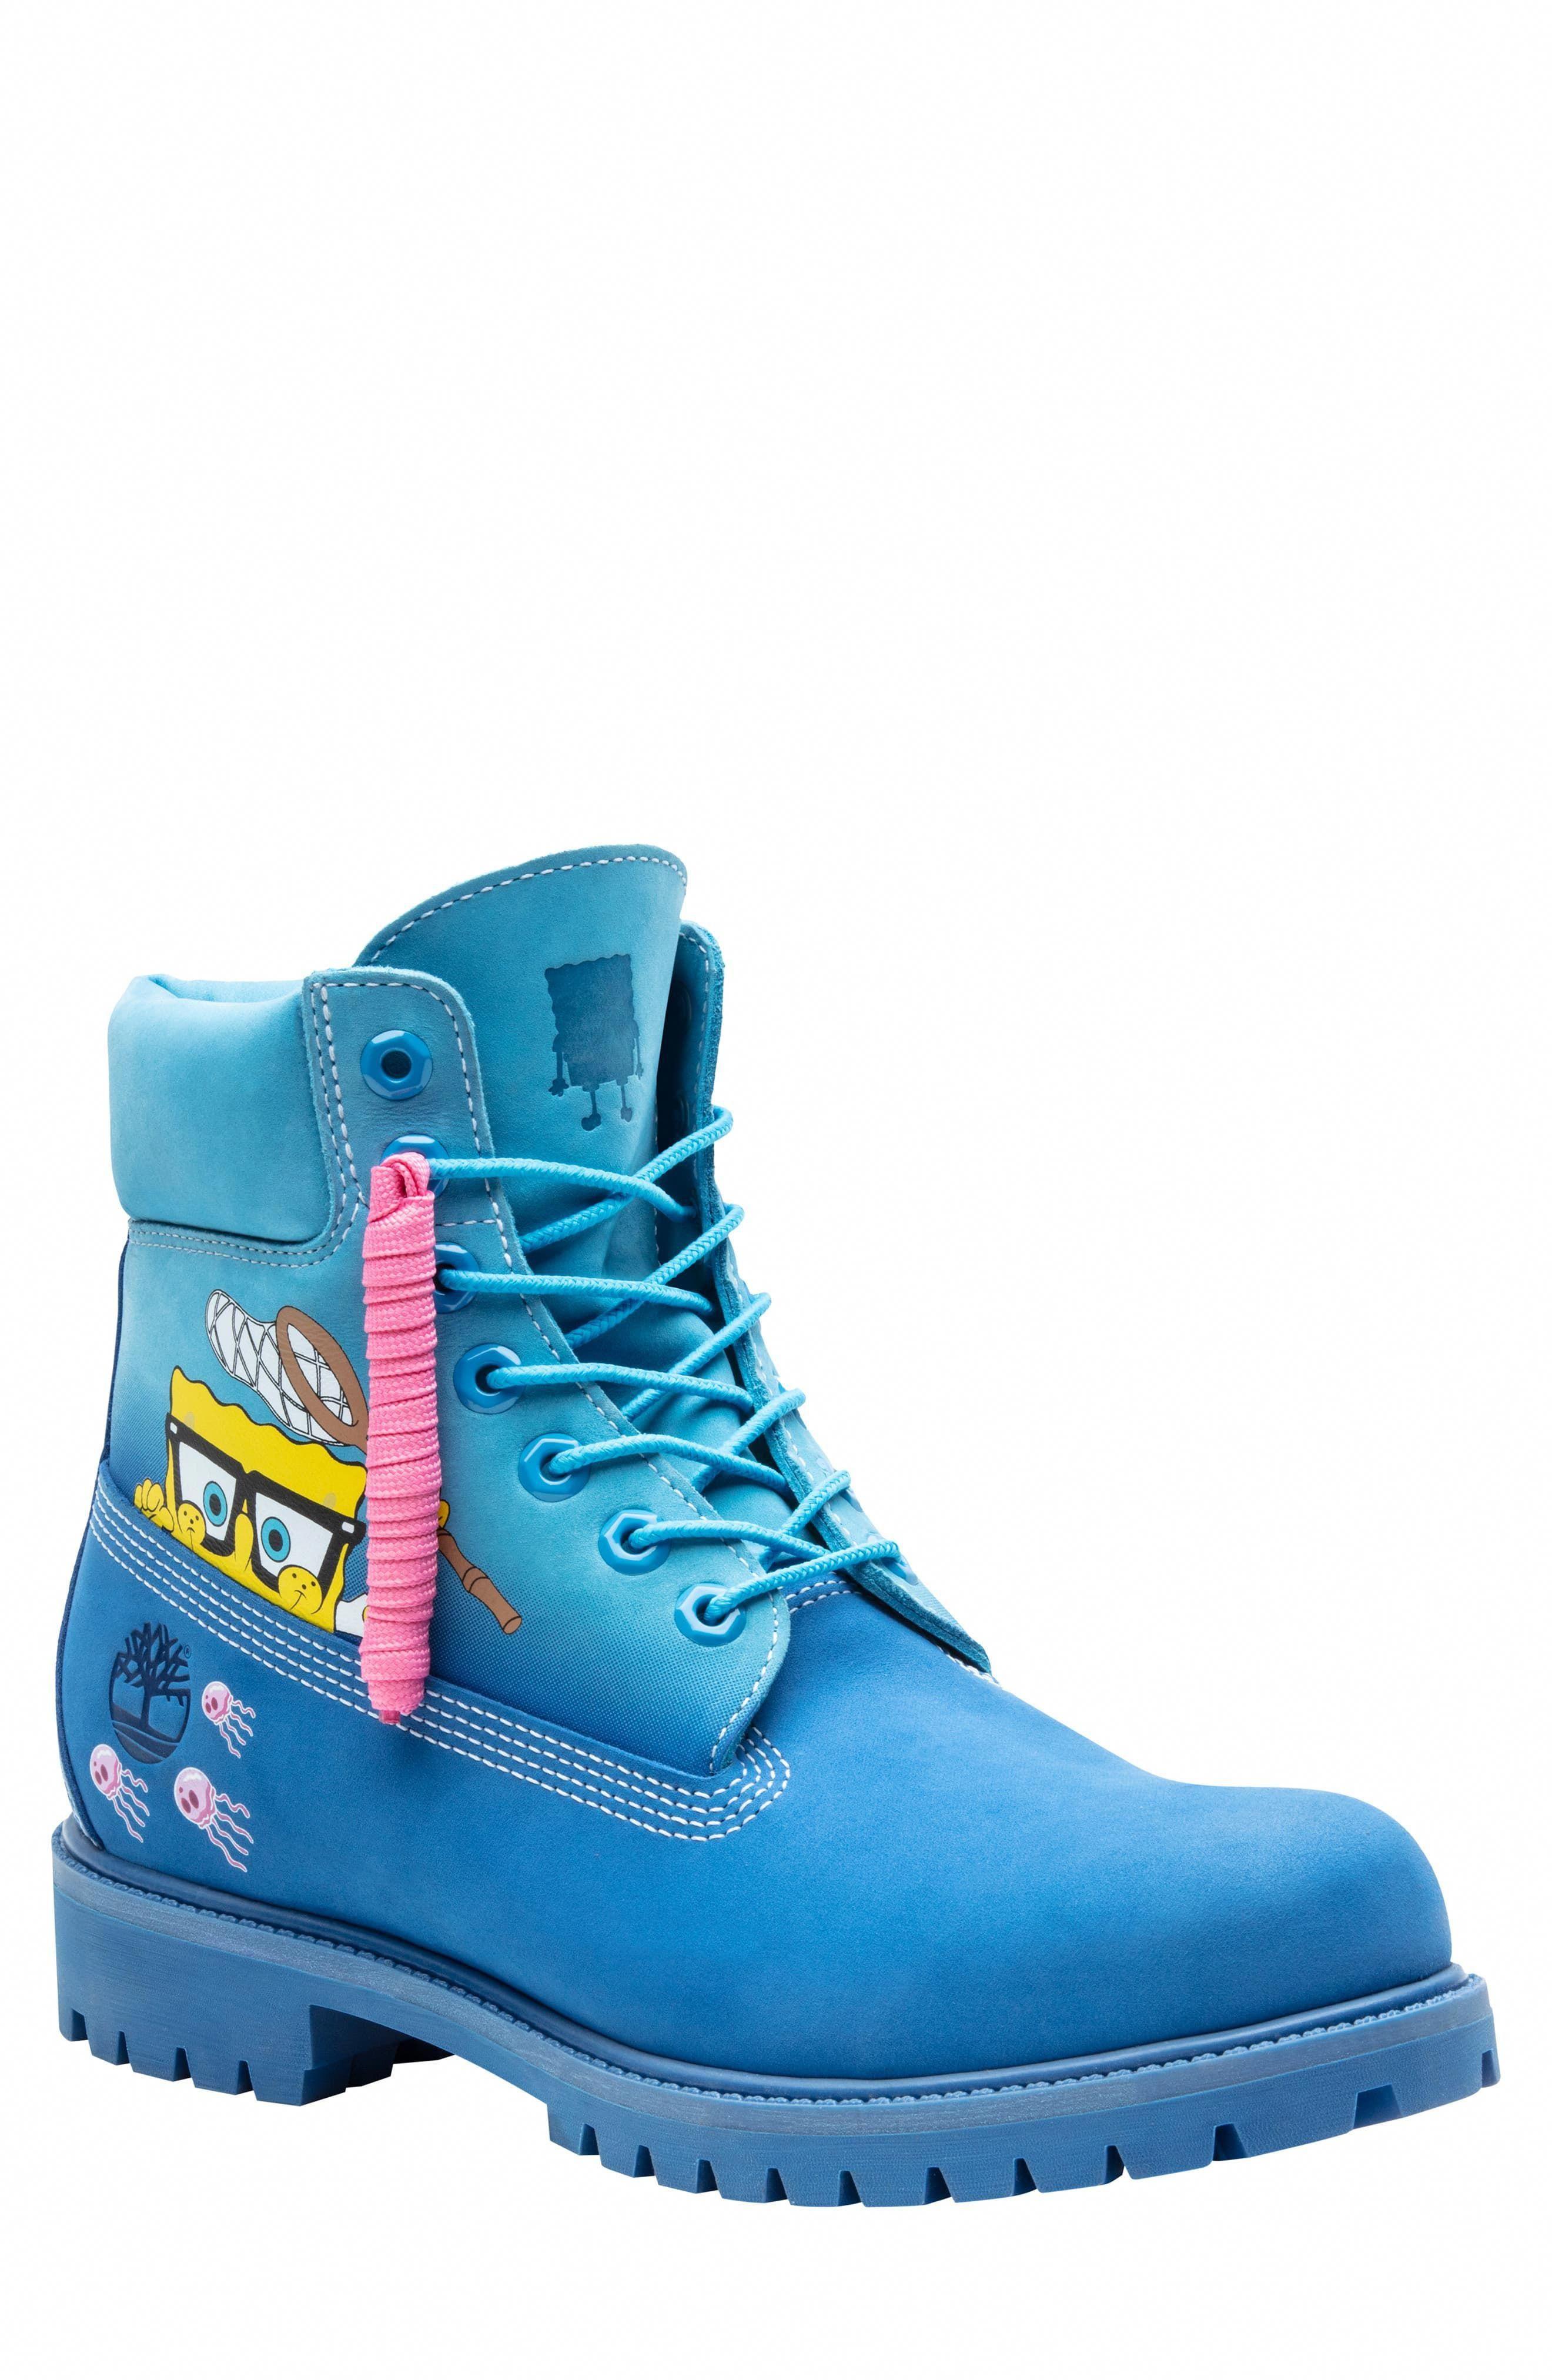 Spongebob Timberlands : spongebob, timberlands, Men's, Timberland, Spongebob, Waterproof, Plain, Boot,, #TimberlandBoots, Boots,, Boots, Outfit